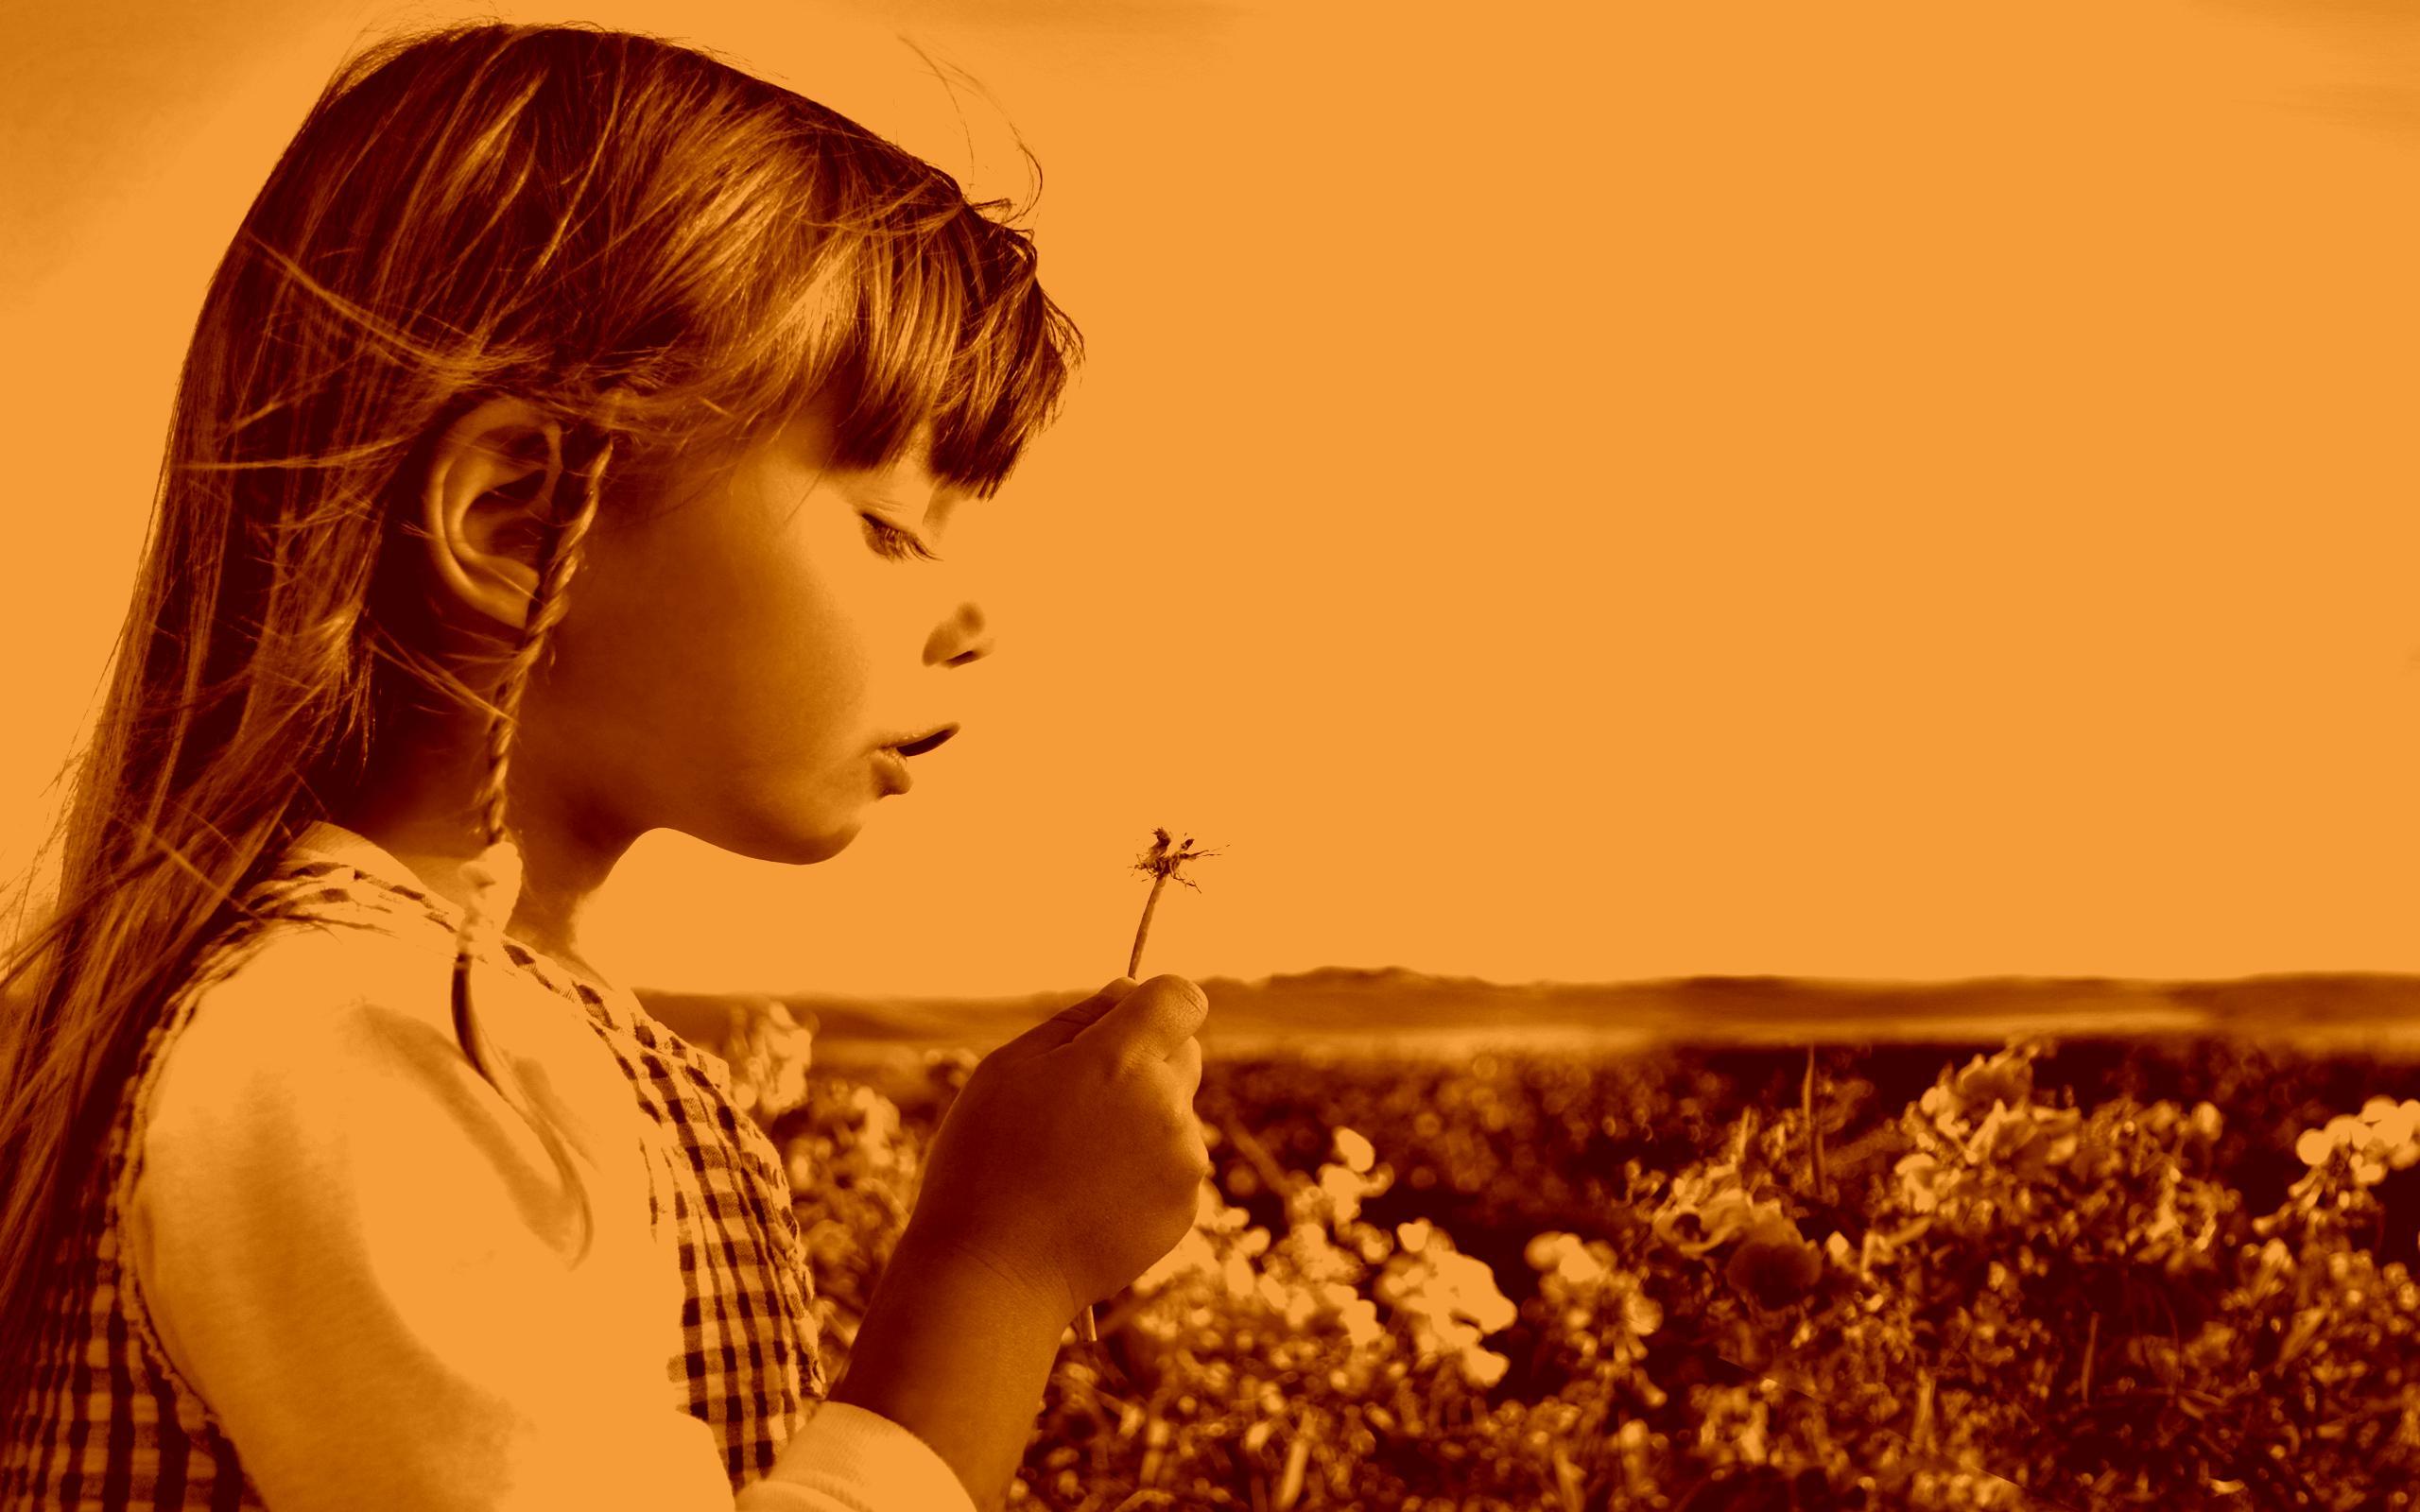 vintage-sepia_little_girl_field_grass_flowers_clouds_hd-wallpaper-52539